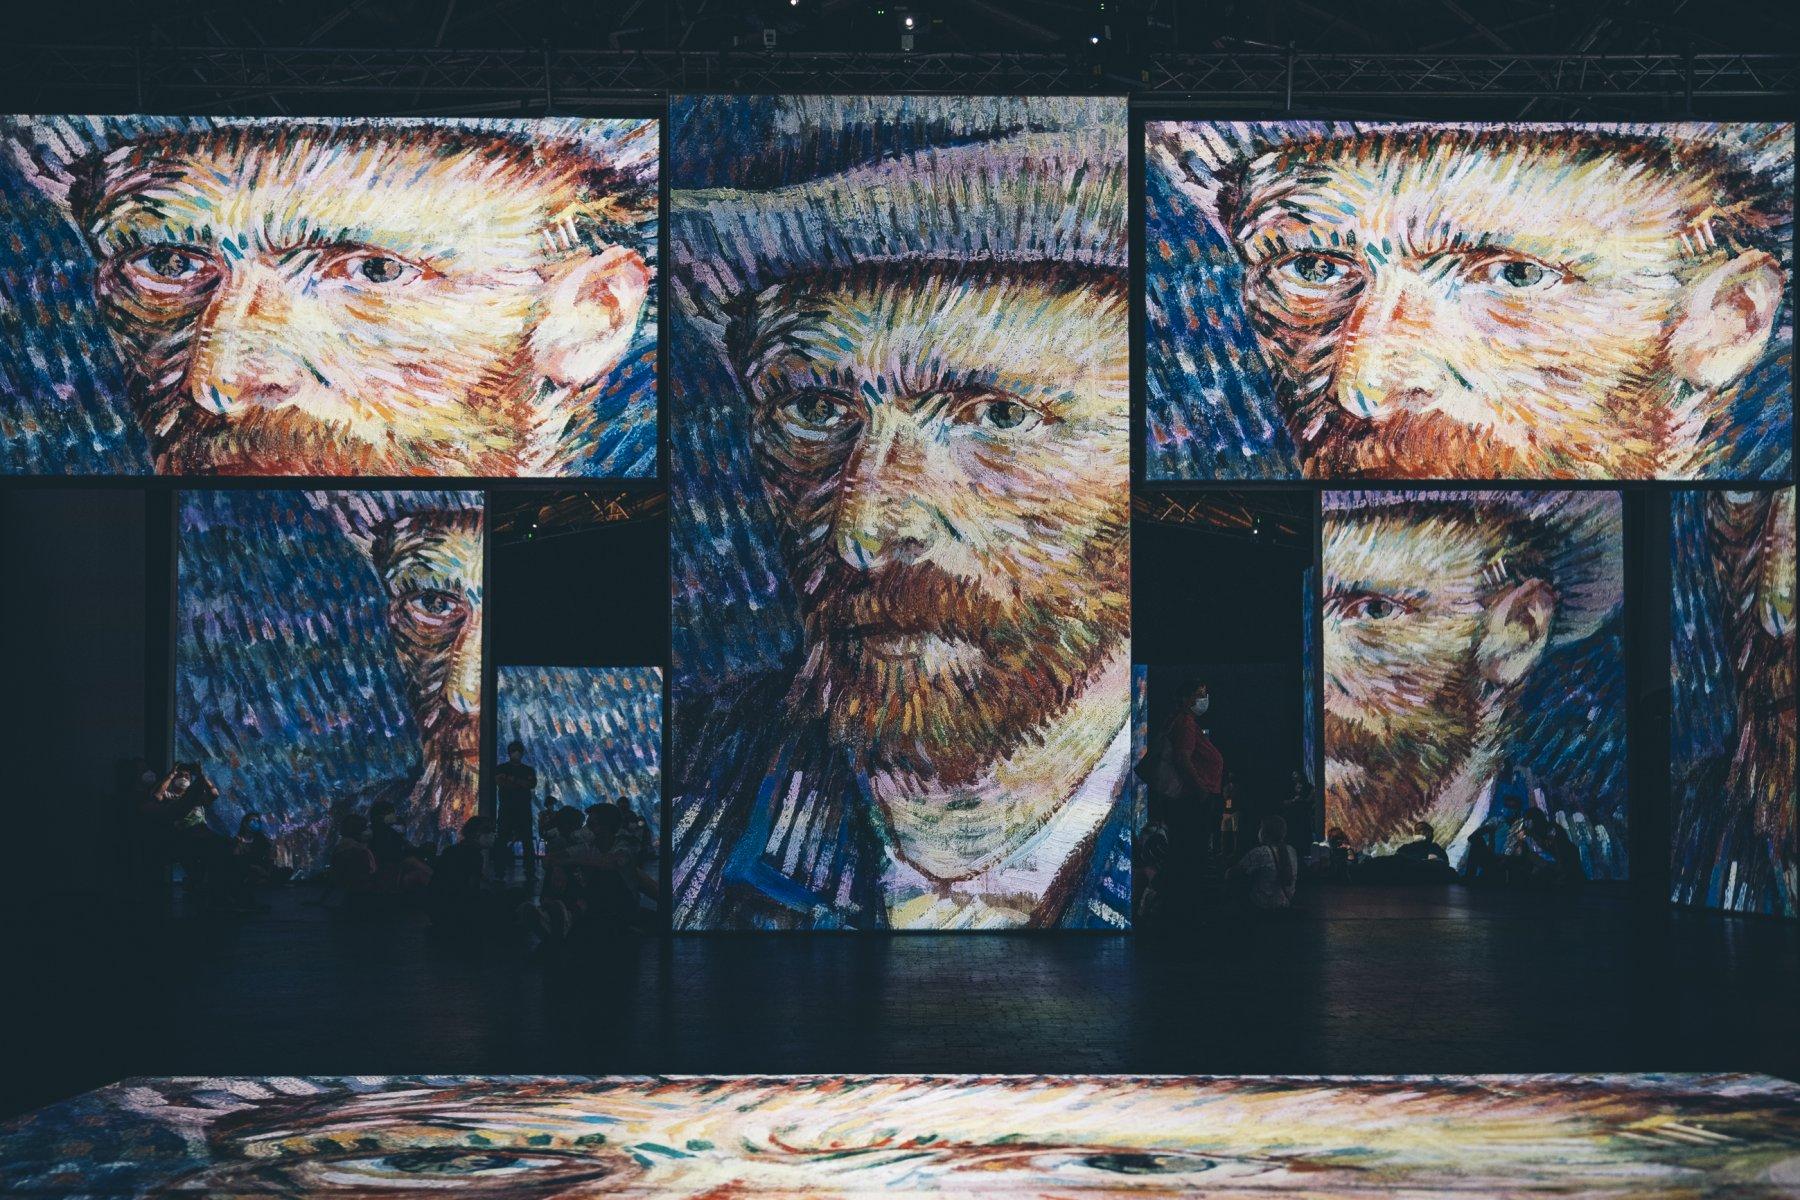 Van Gogh Alive 6304 – ©wunderland media GmbH